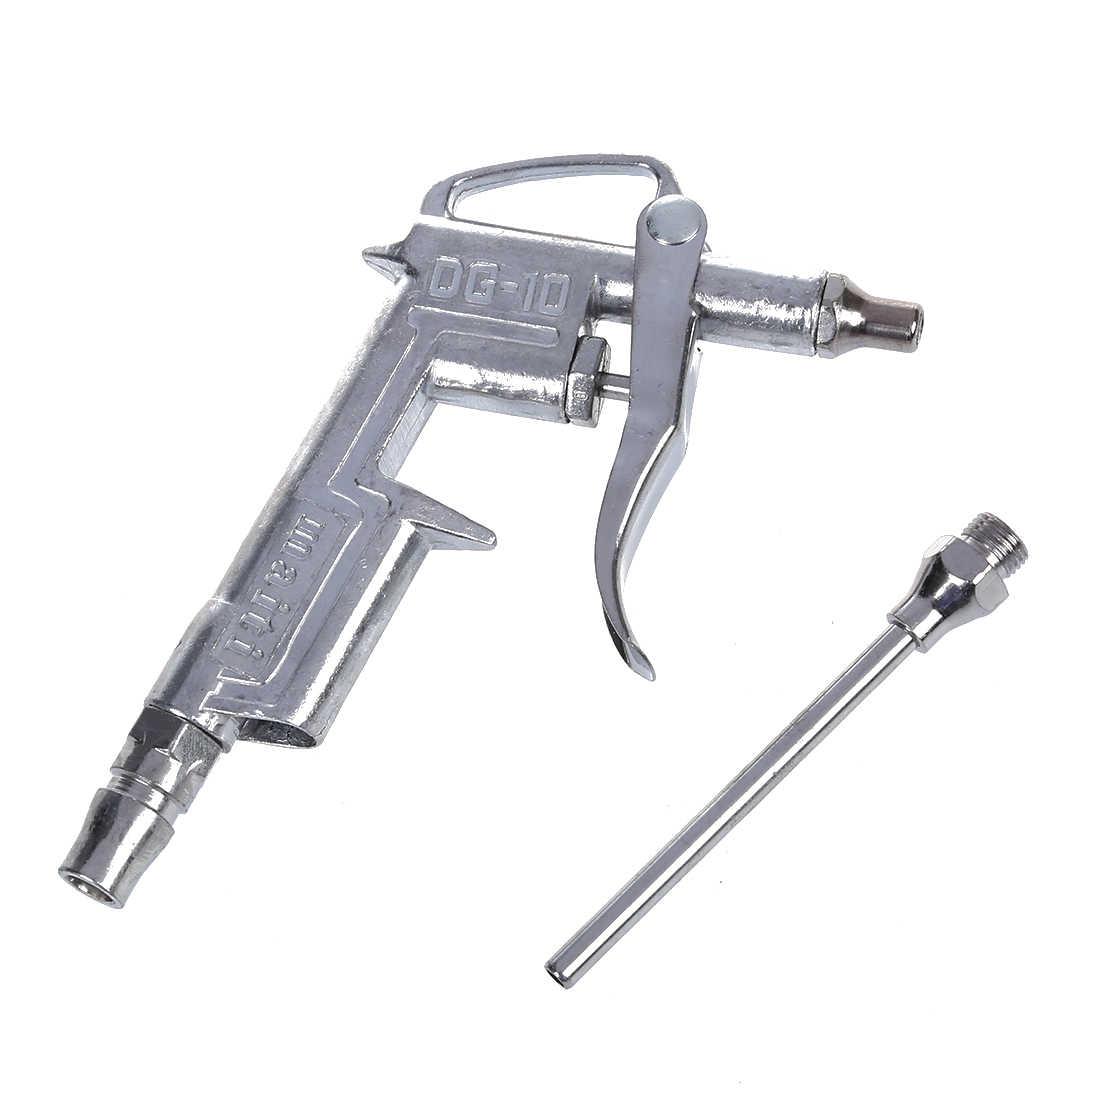 Beste Dust Verwijderen Air Blow Gun Cleaning Tool Silver Tone